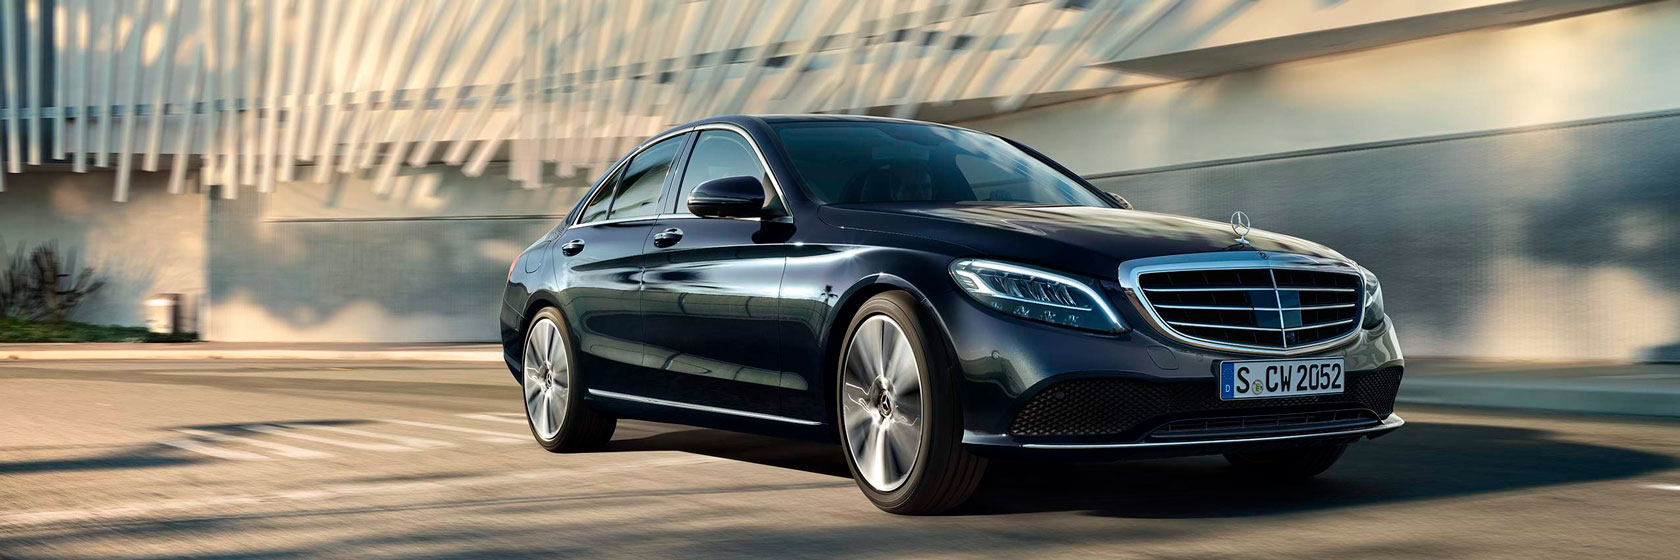 Безпека нового Mercedes-Benz C-Class Sedan